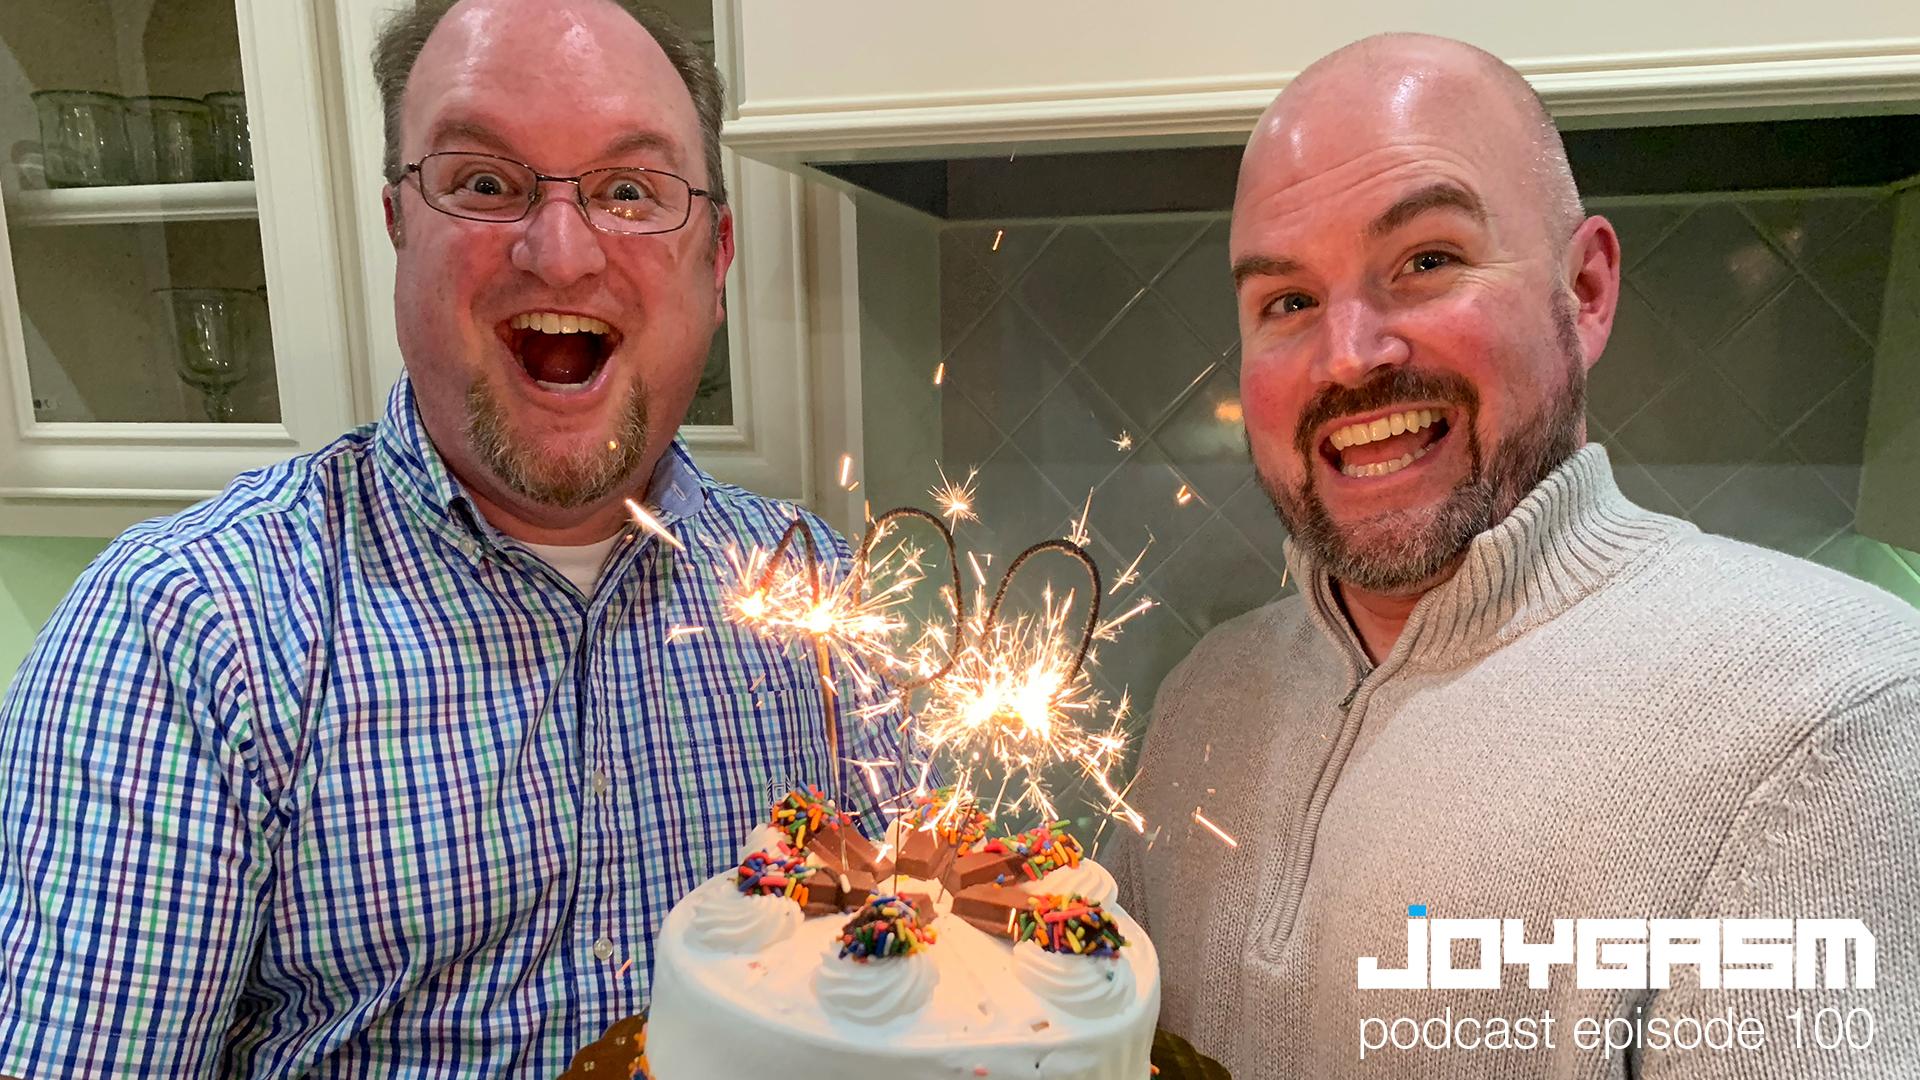 Ep. 100: Achievement Unlocked – Celebrating Our 100th Episode!